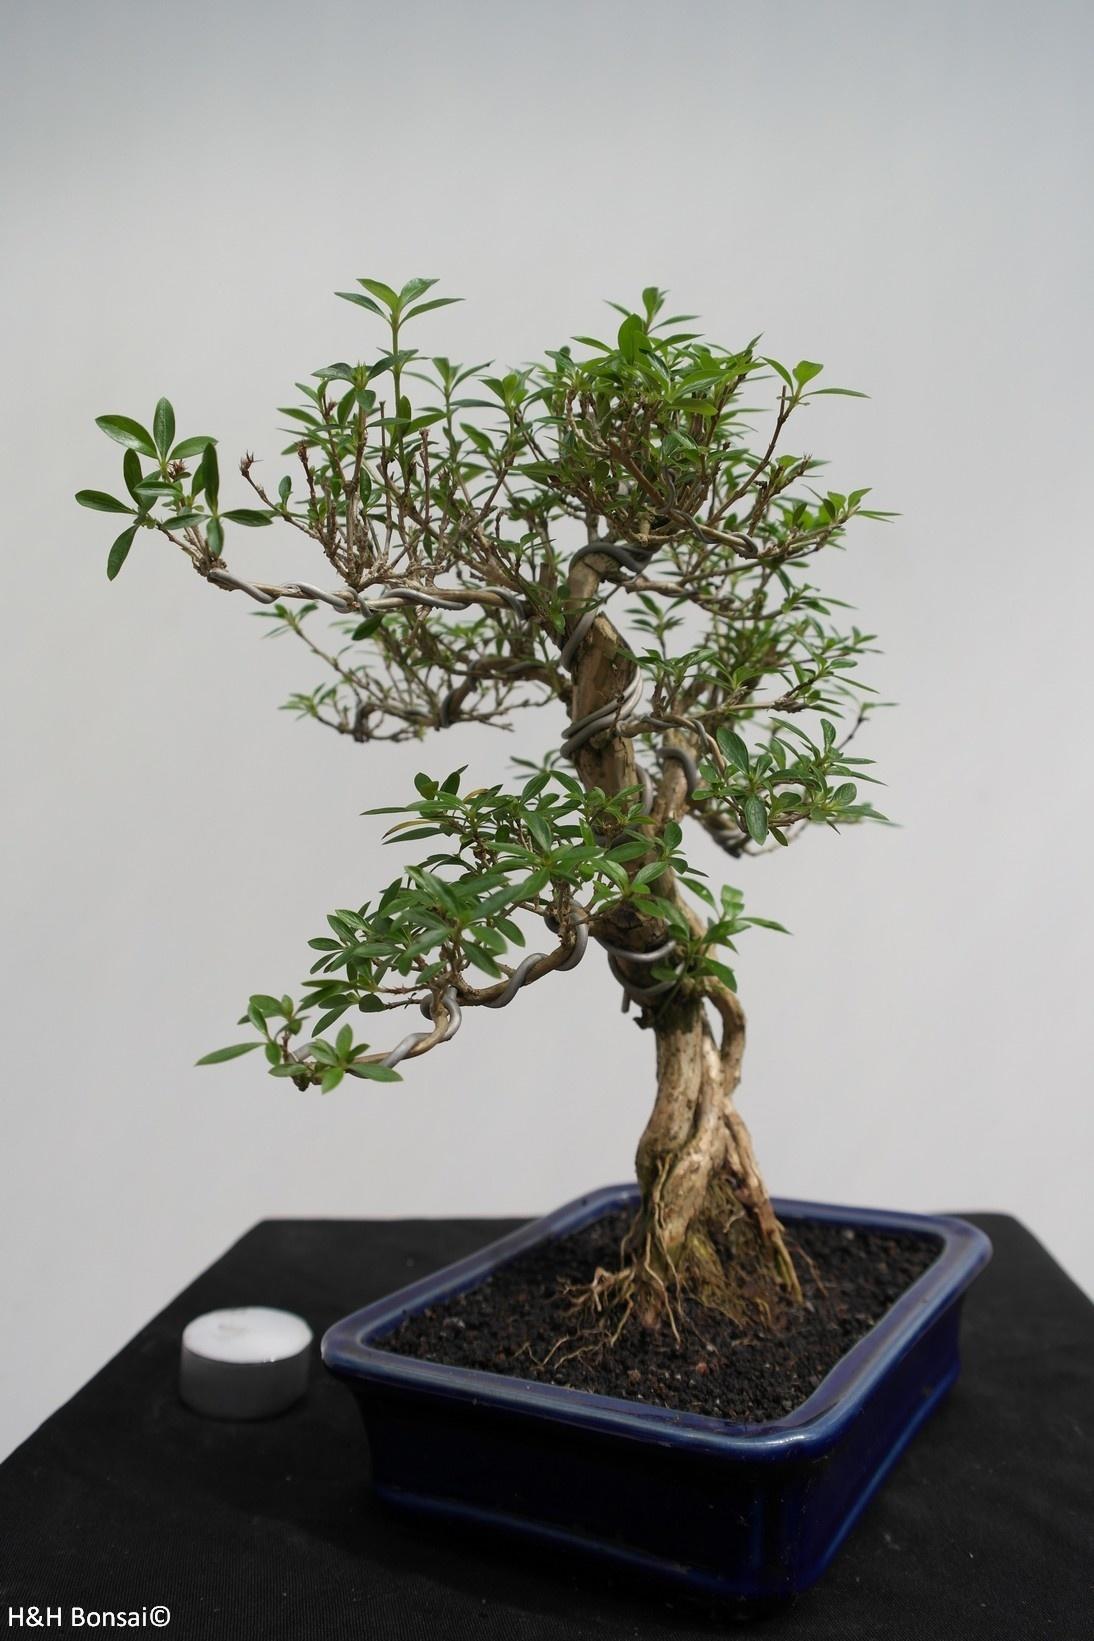 Bonsai Serissa foetida, no. 7863